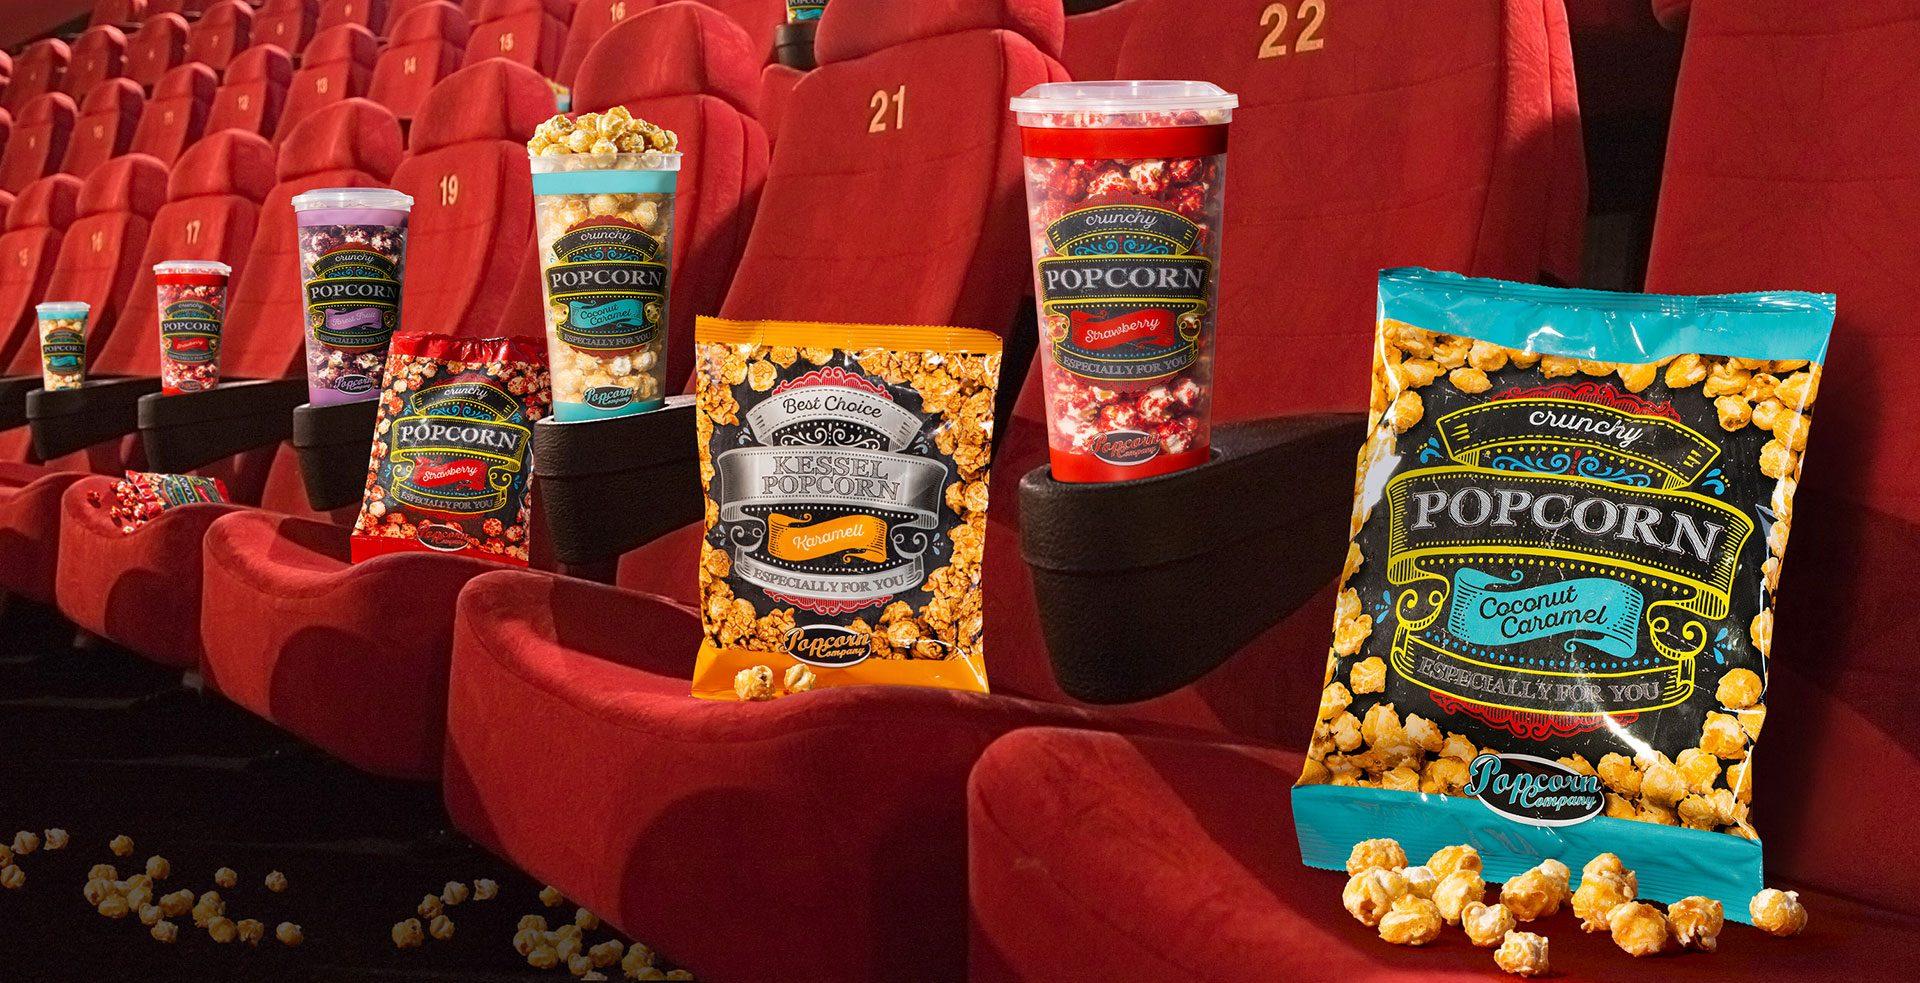 Verpackungsdesign Malvega: Popcorn